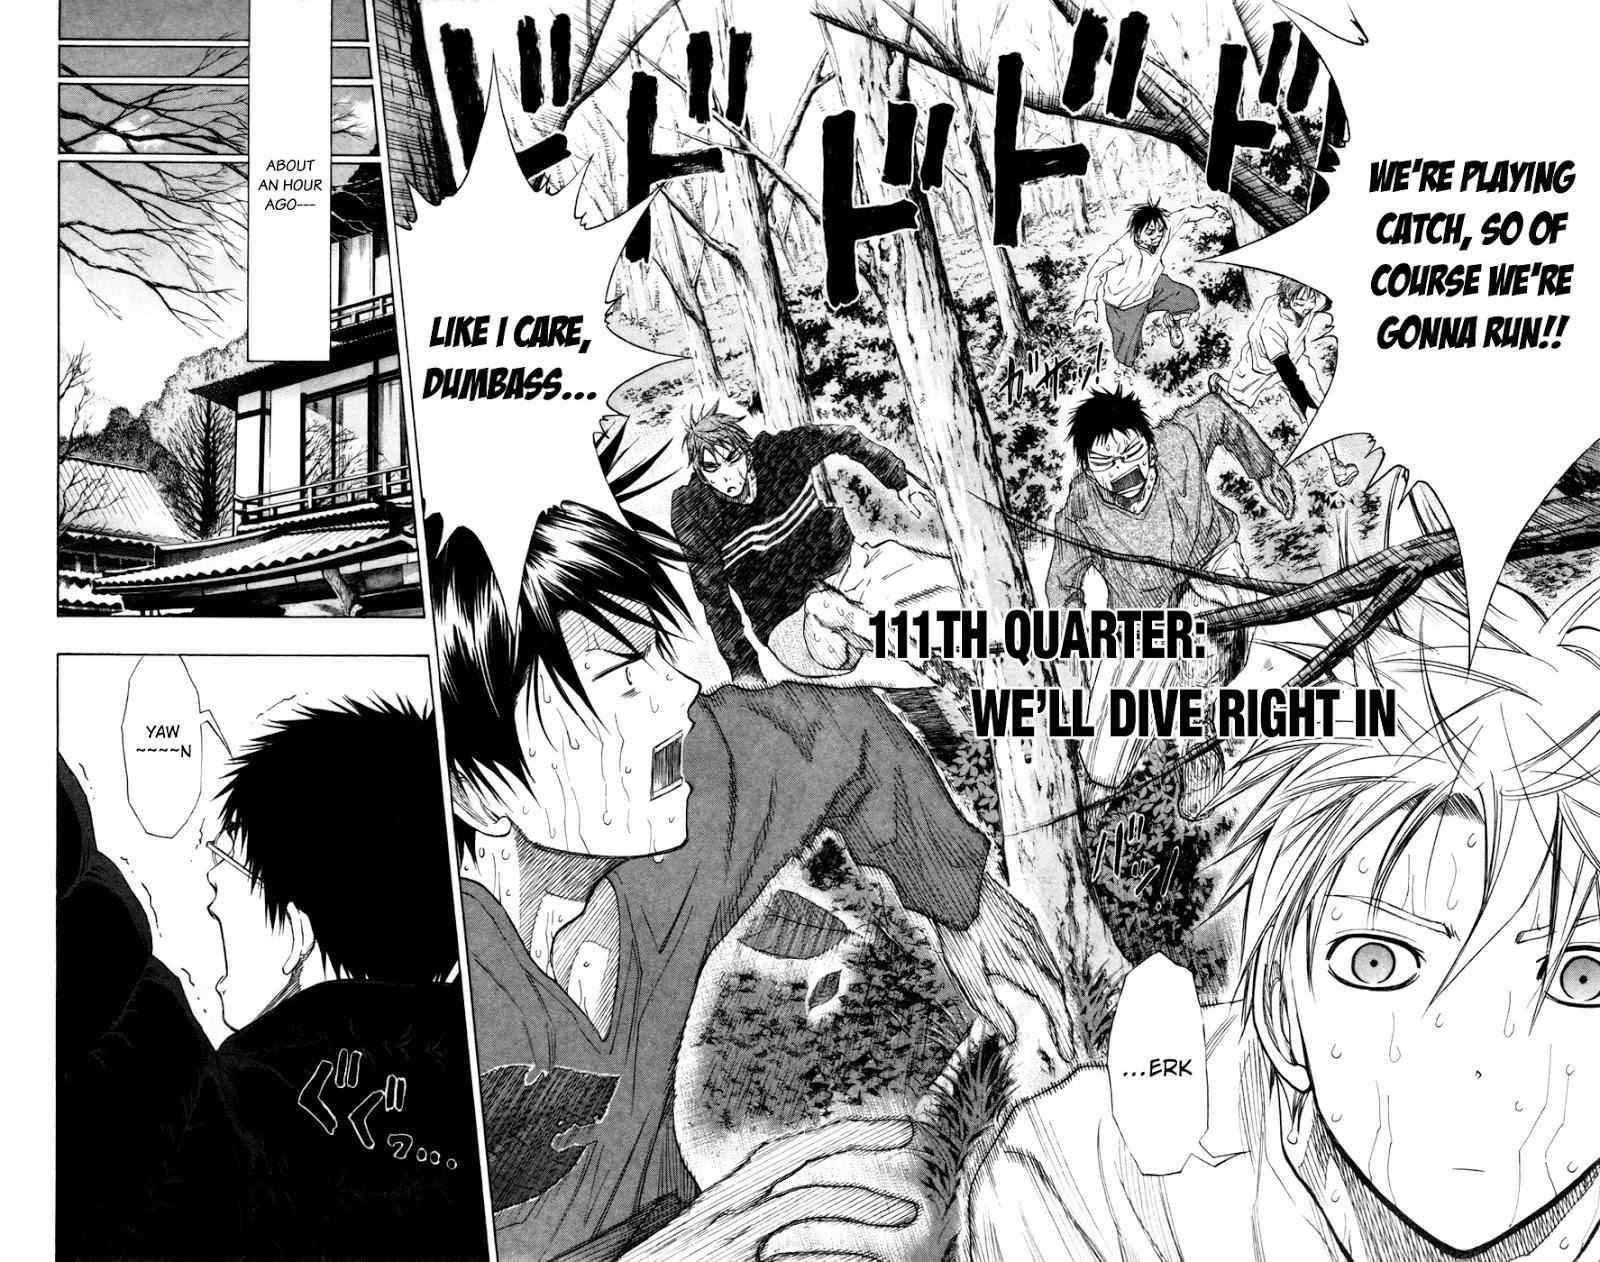 Kuroko no Basket Manga Chapter 111 - Image 02-03